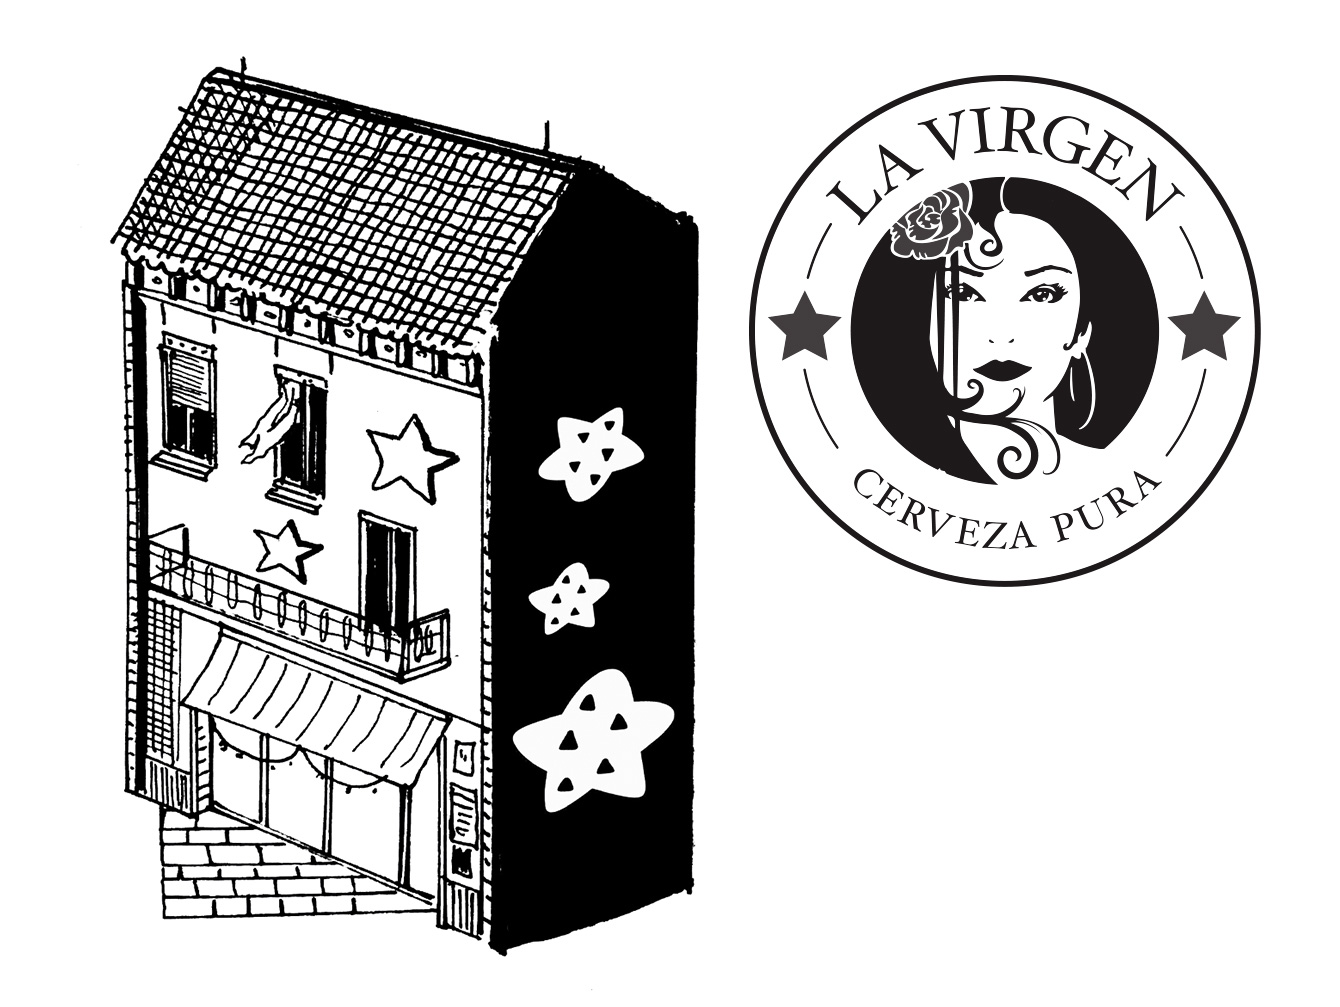 The Brewery La Virgen